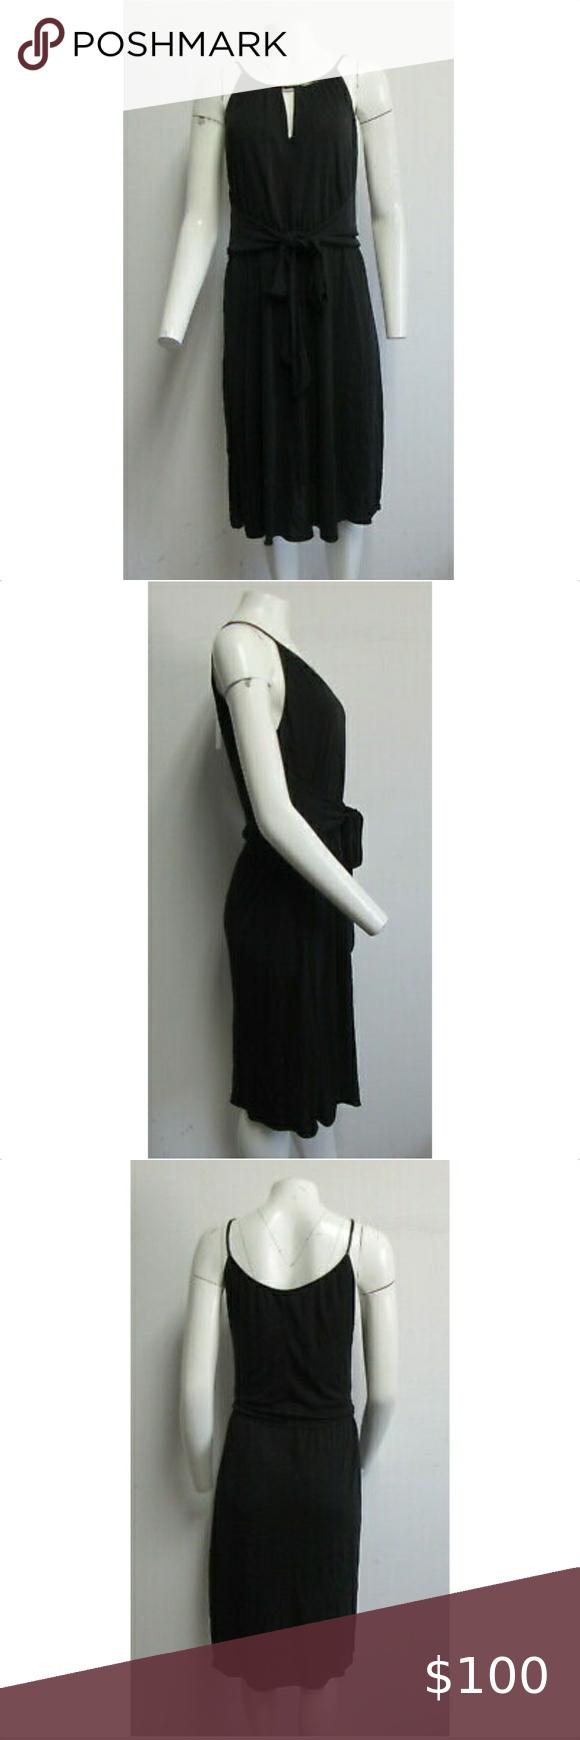 Elie Tahari 348 Black Tie Front Cocktail Dress Elie Tahari Cocktail Dress Elie Tahari Dresses [ 1740 x 580 Pixel ]